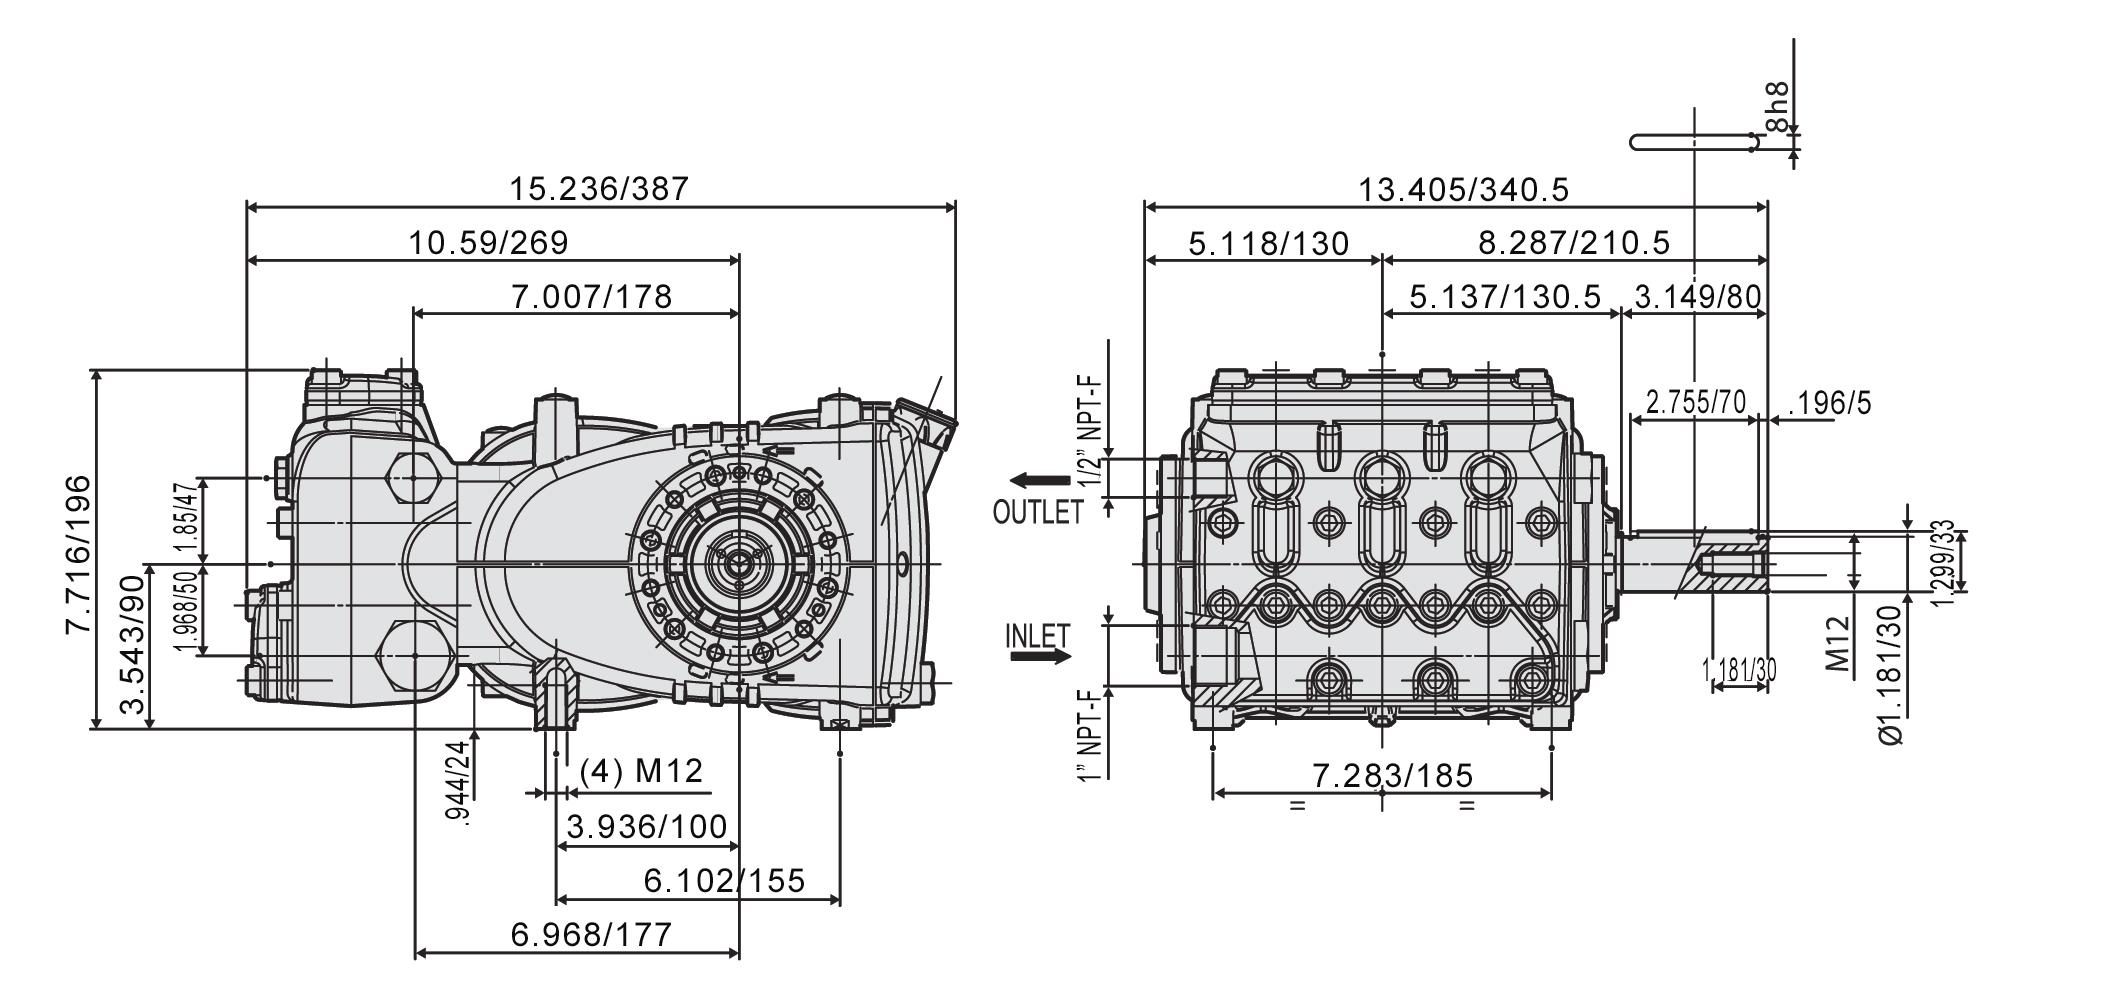 2006 toyota tacoma ke diagram